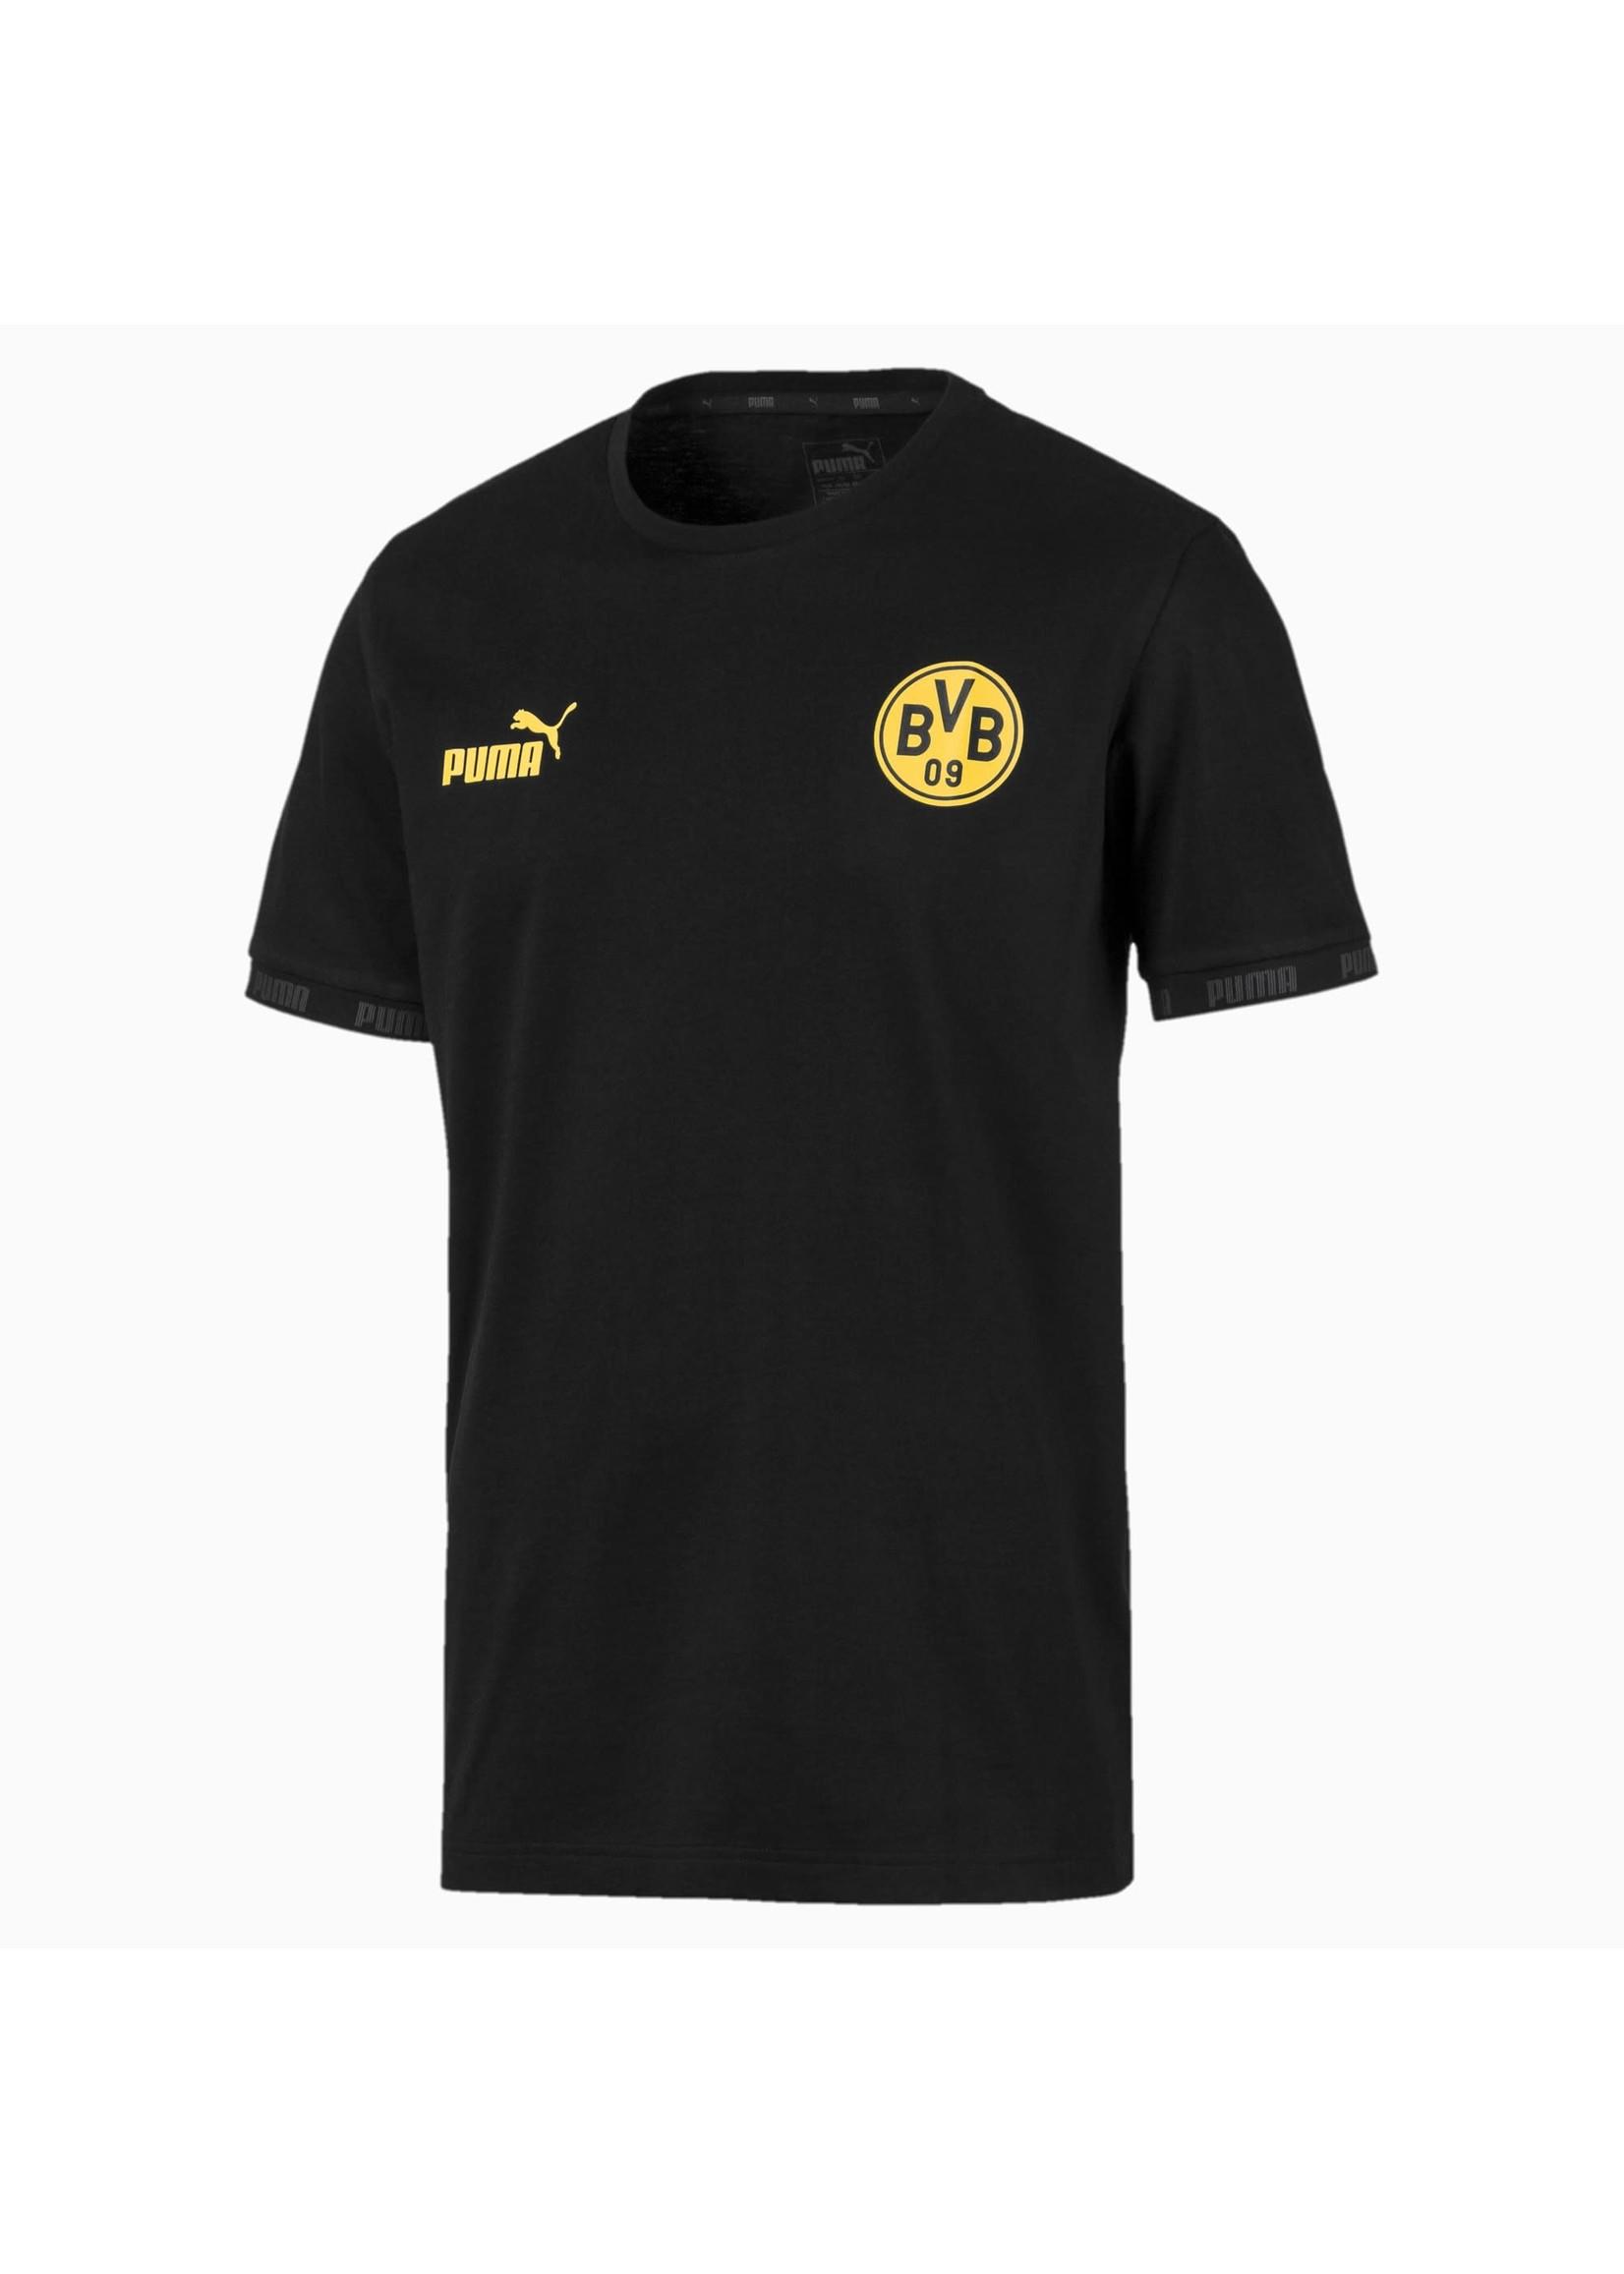 Puma Borussia Dortmund T-Shirt - 19/20 Away